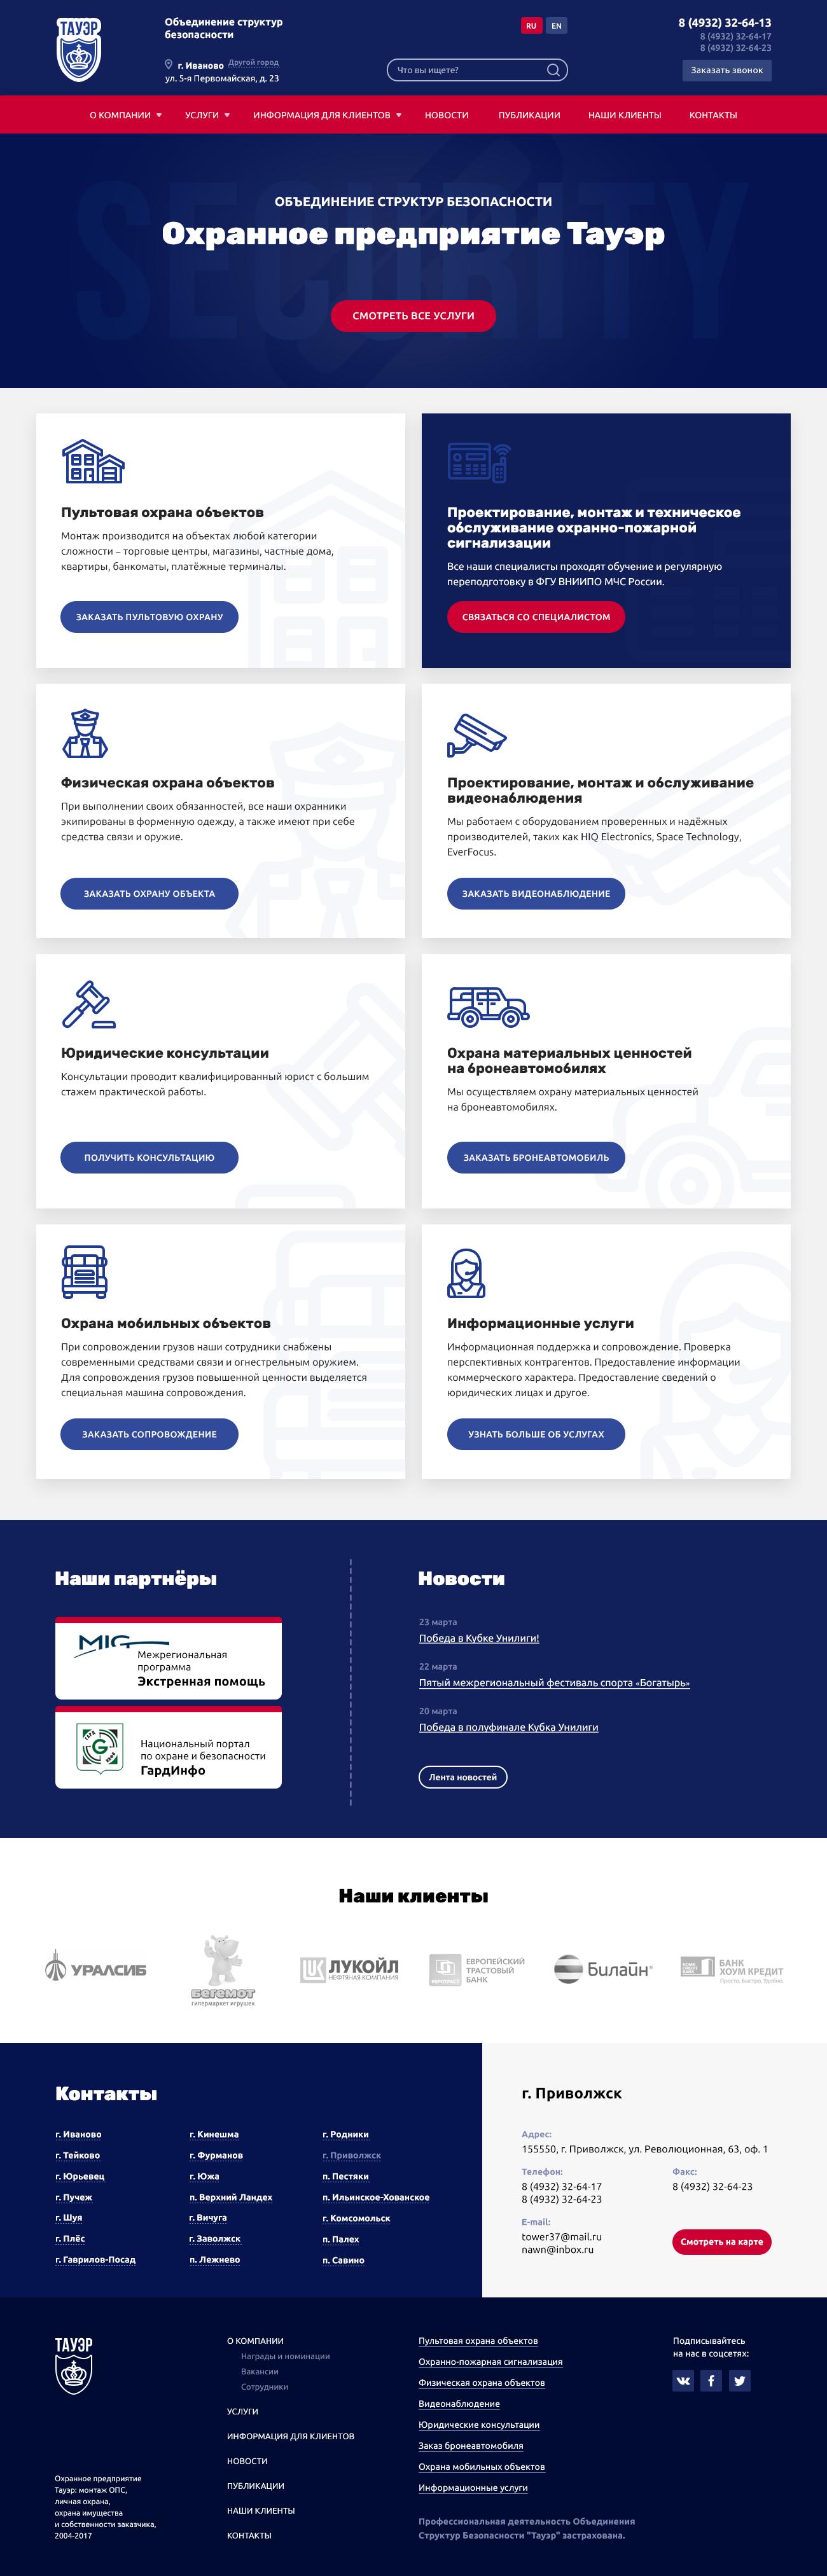 Редизайн существующего сайта компании (ЗАВЕРШЁН) фото f_86858fa1ba80a4e5.png